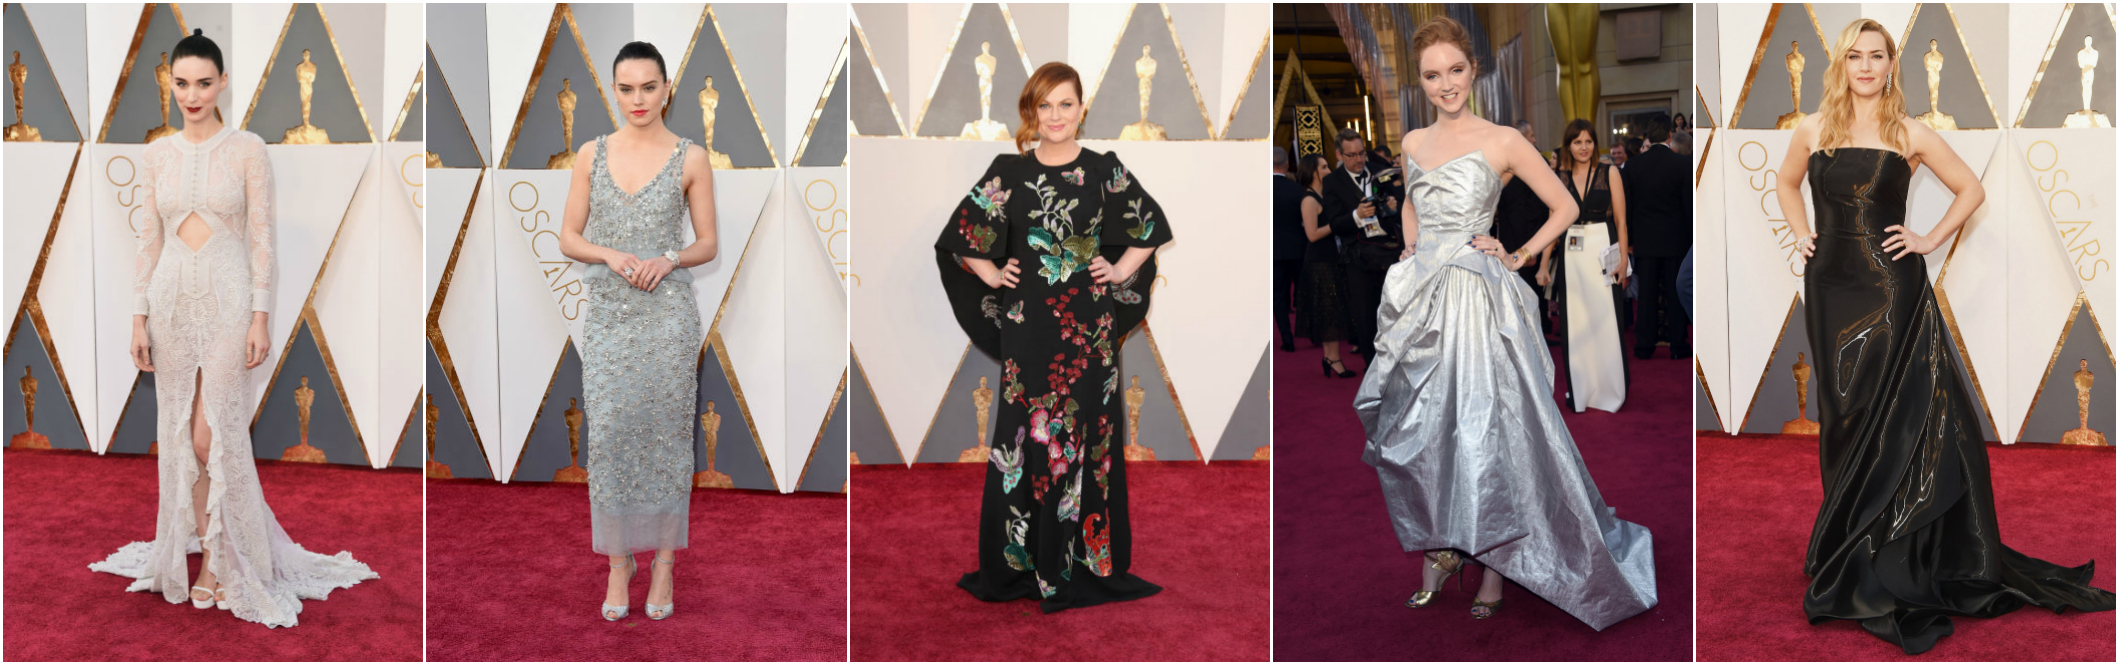 2016 Oscars Worst Dressed Celebrities